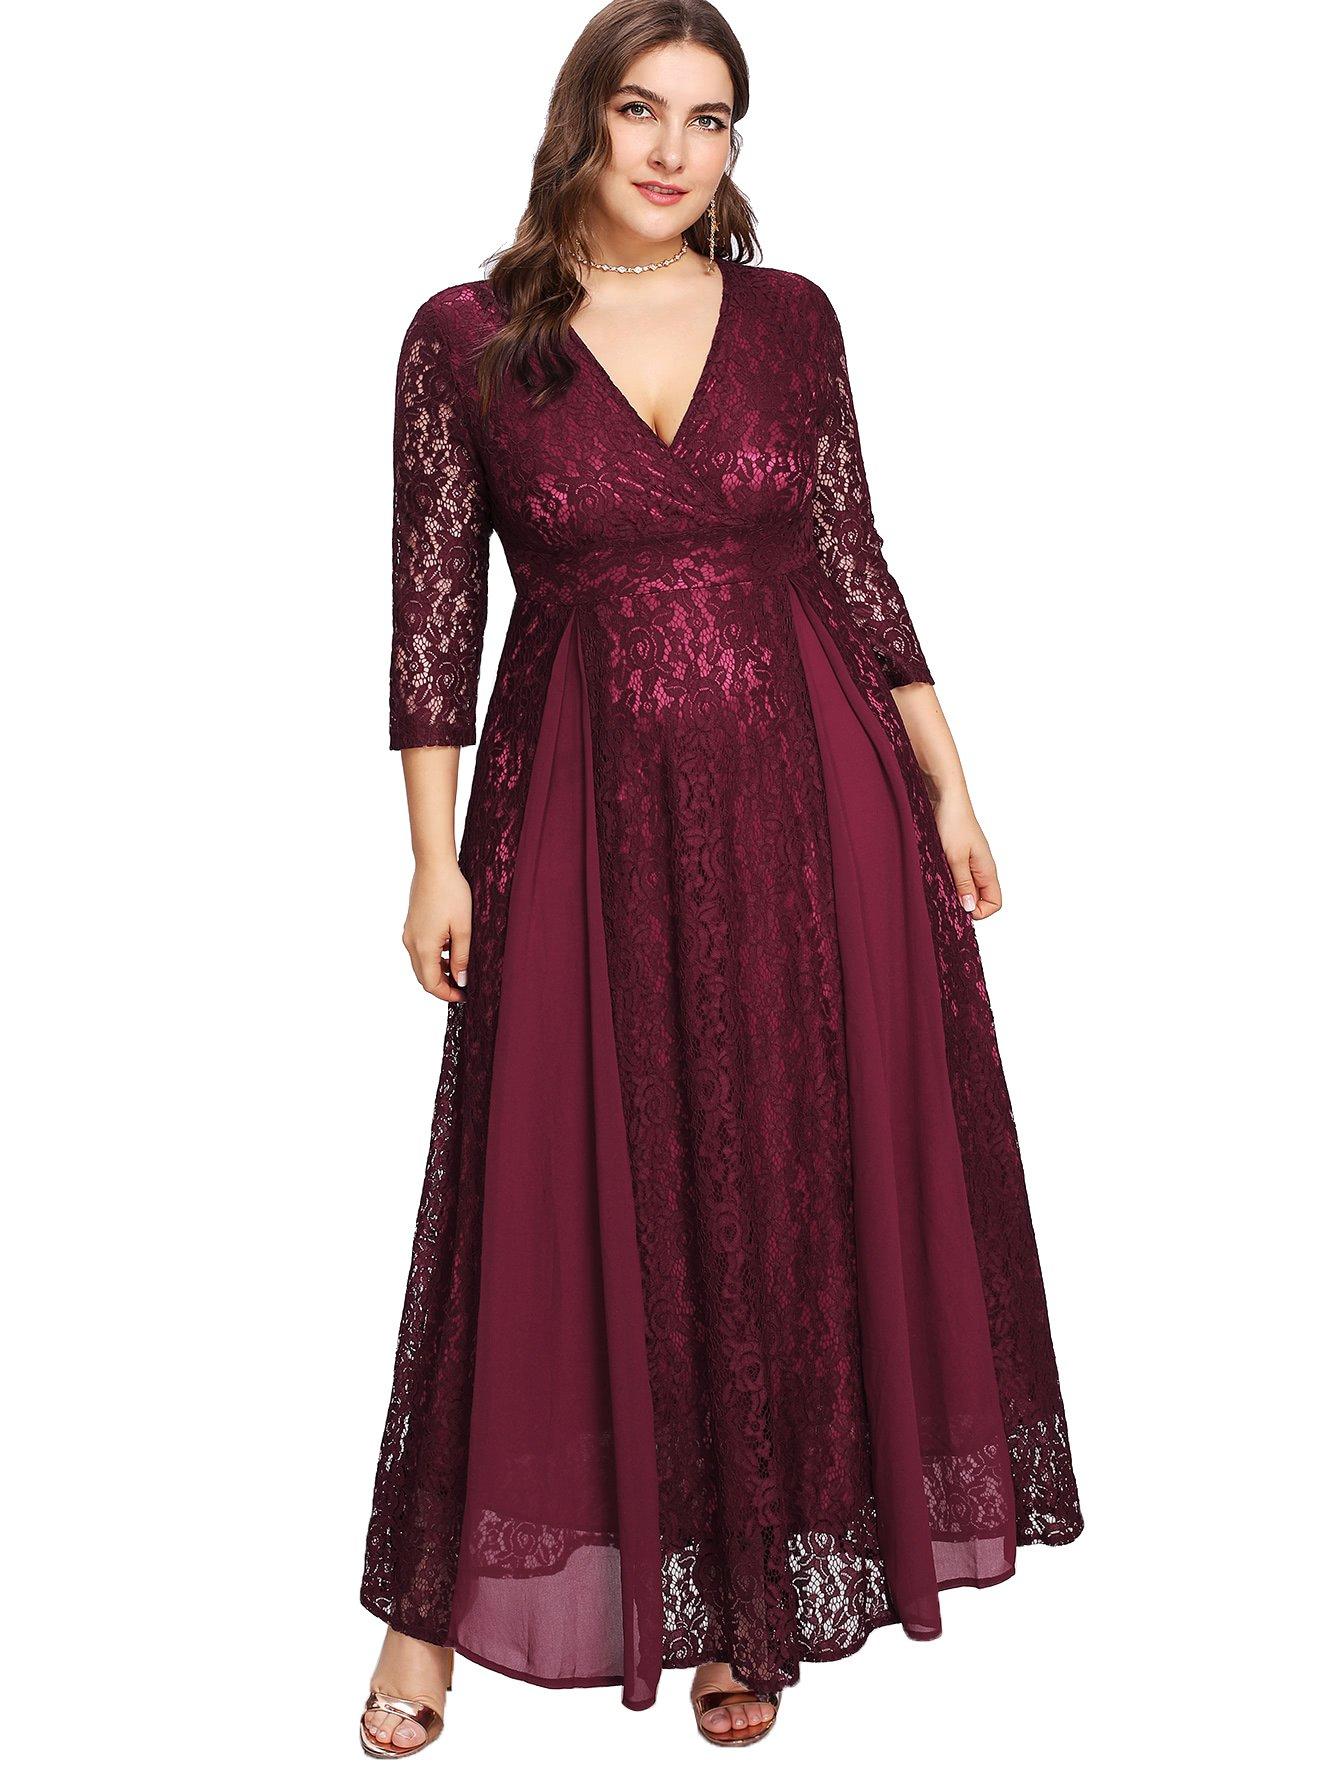 7931a296363 Floerns Women's Plus Size High Waist Lace Wrap Maxi Cocktail Party Dress  Red 5XL